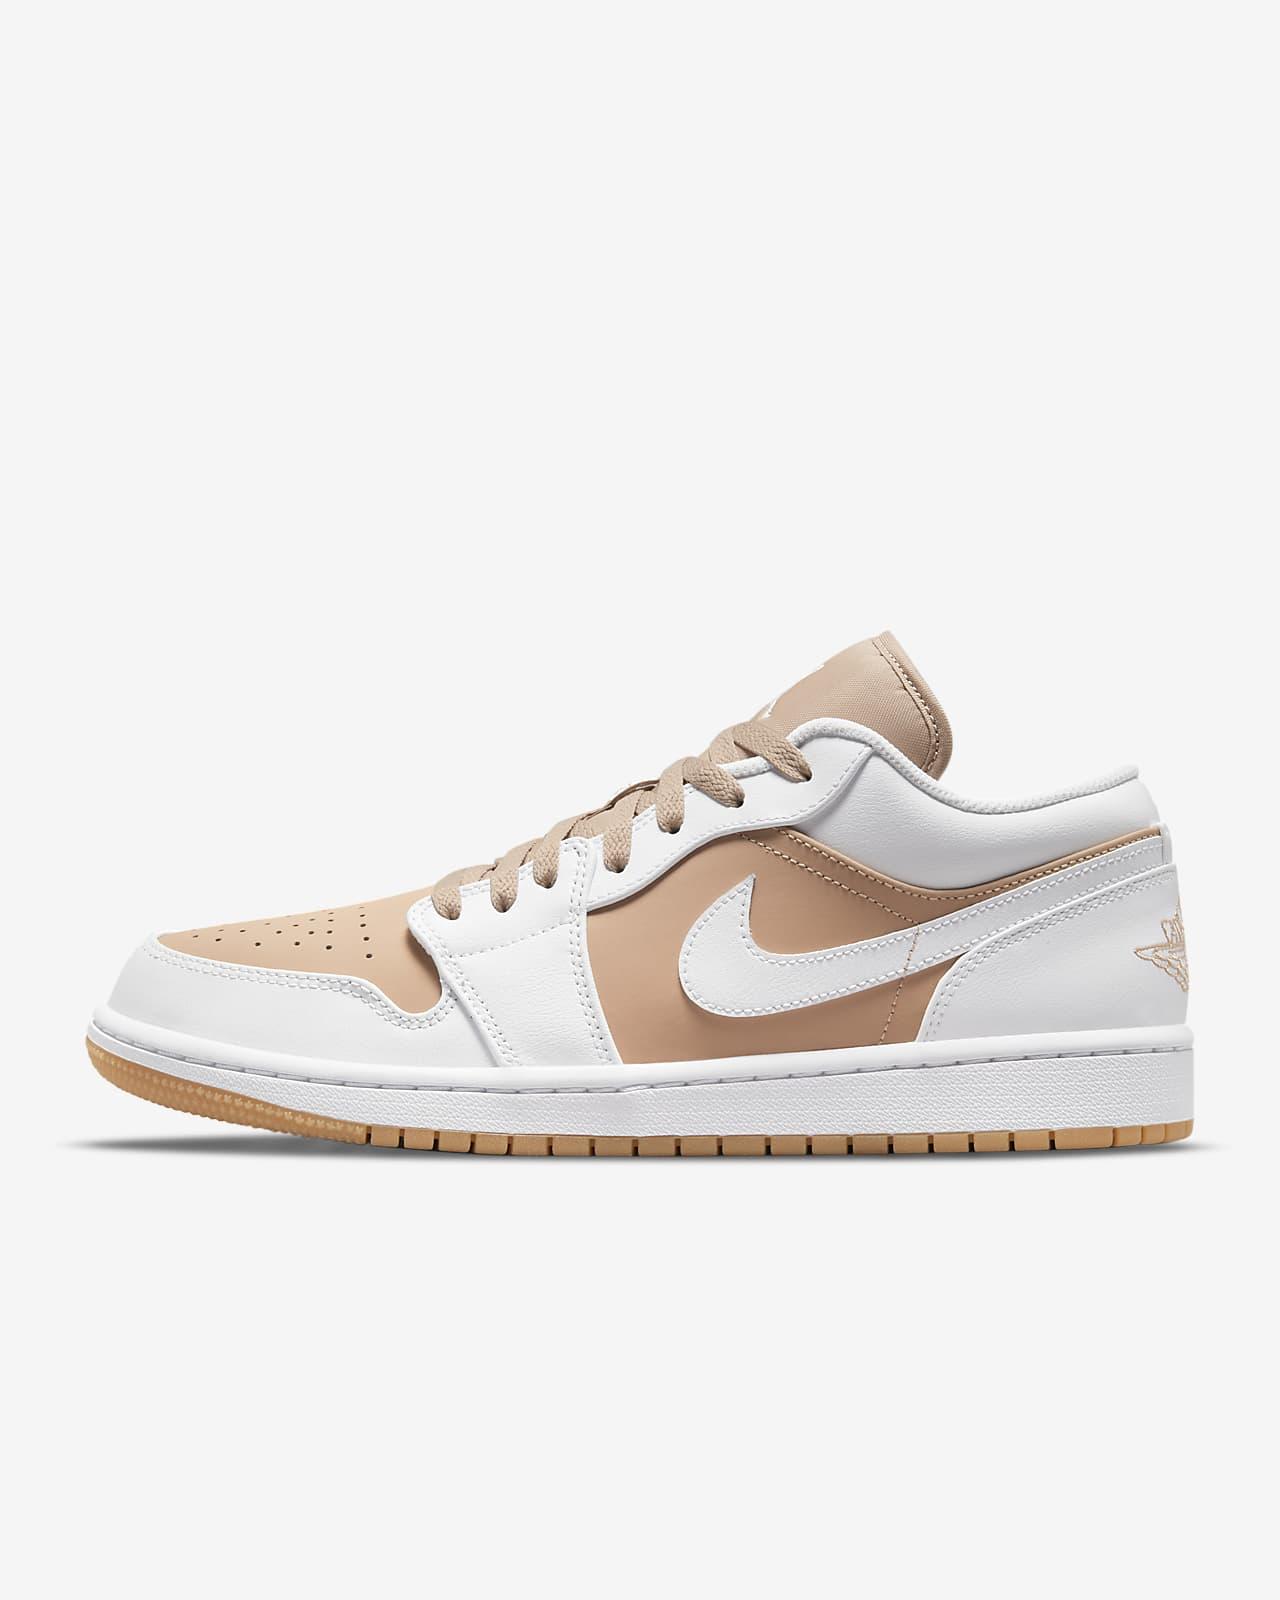 Chaussure Air Jordan 1 Low pour Homme. Nike LU